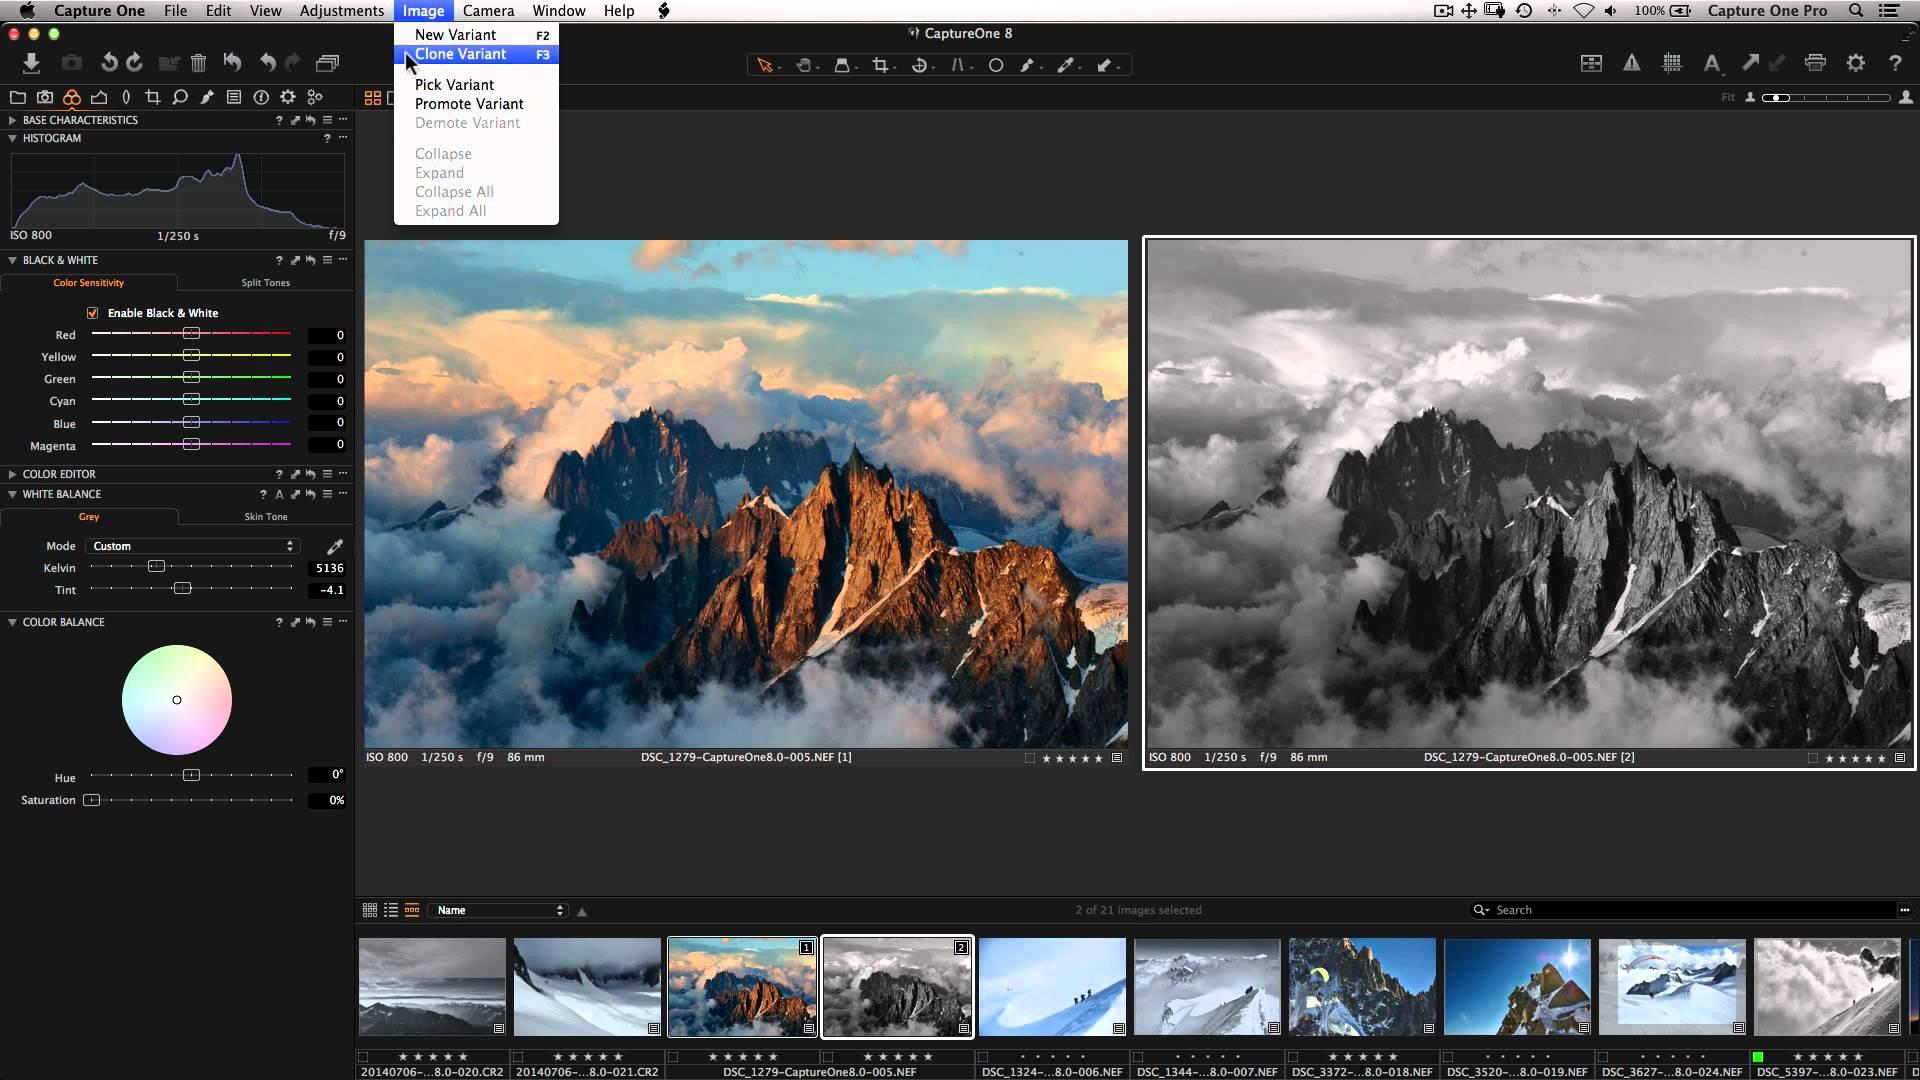 Capture One Pro windows